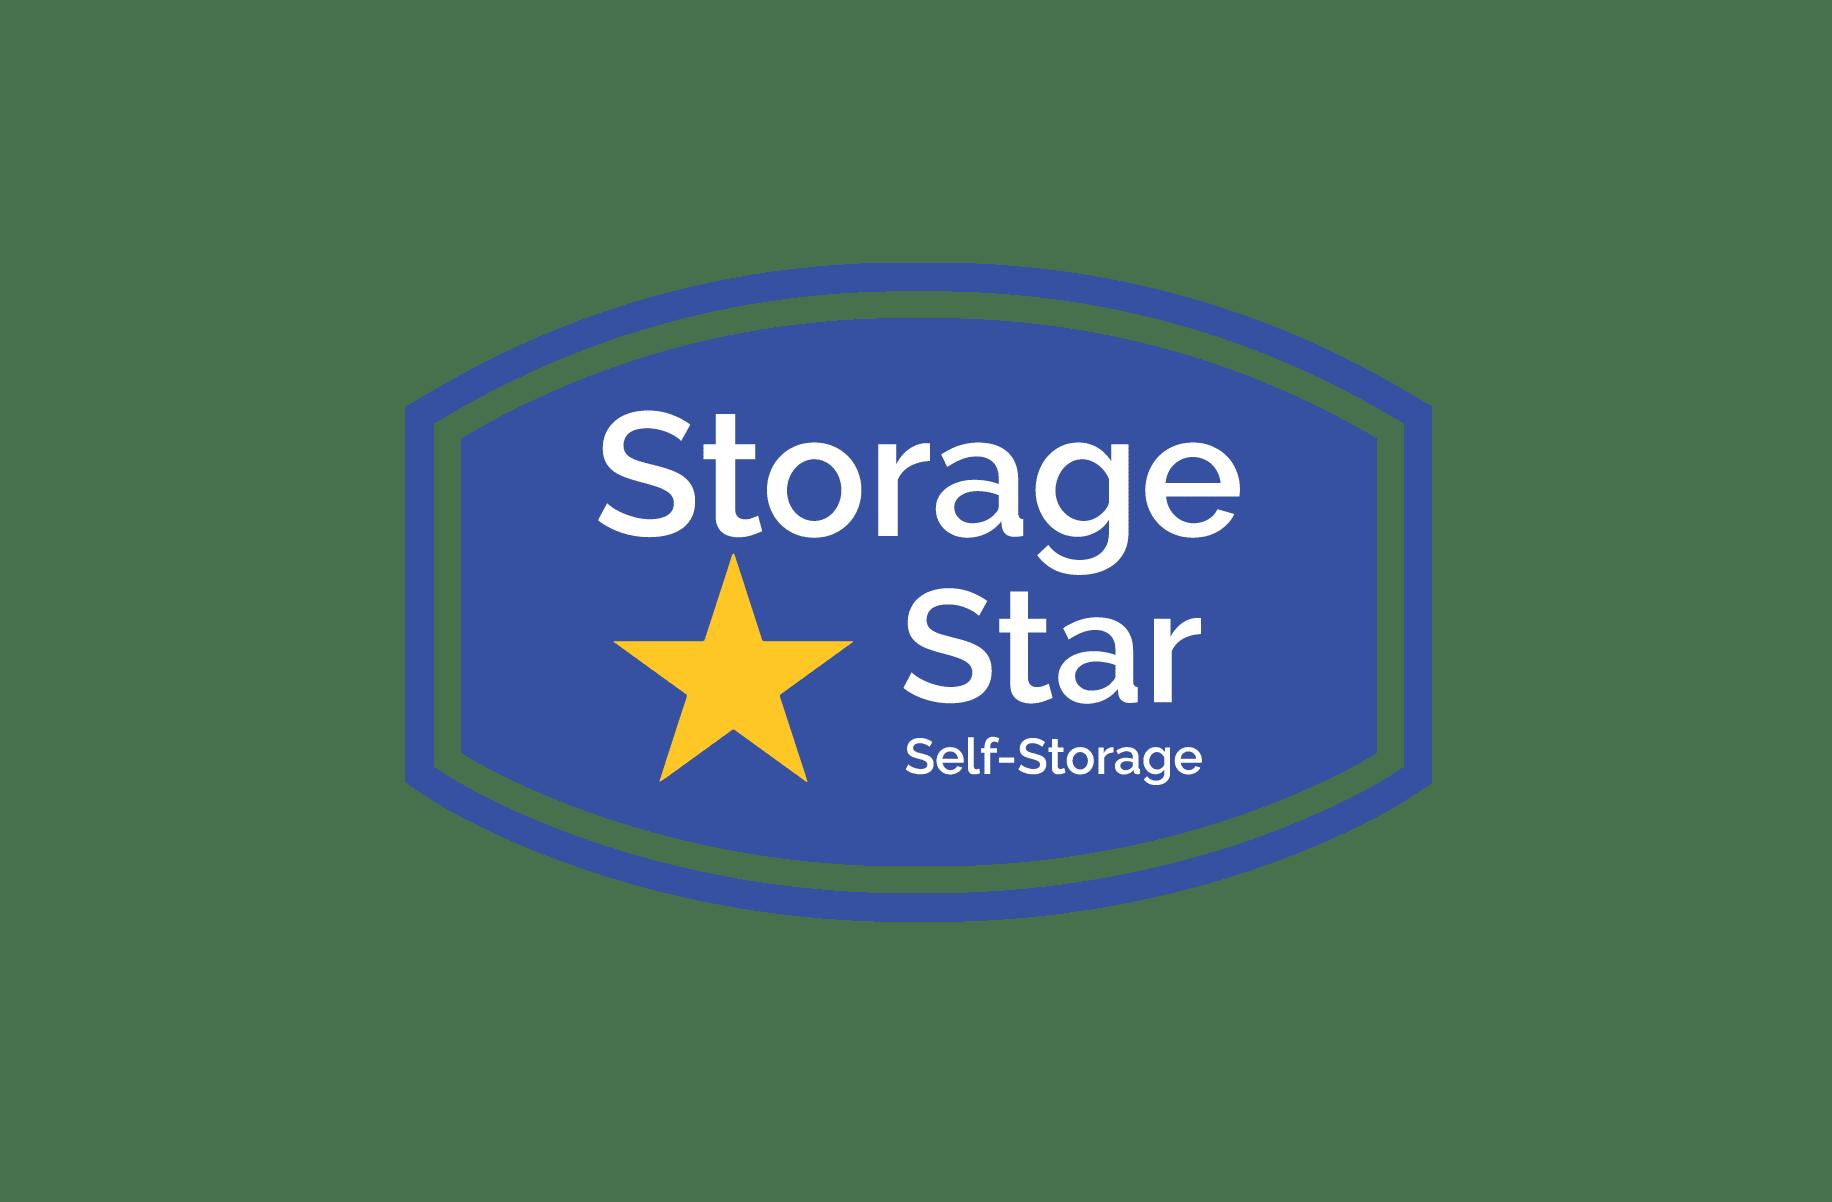 Storage Star Forest Lane in Dallas, Texas logo